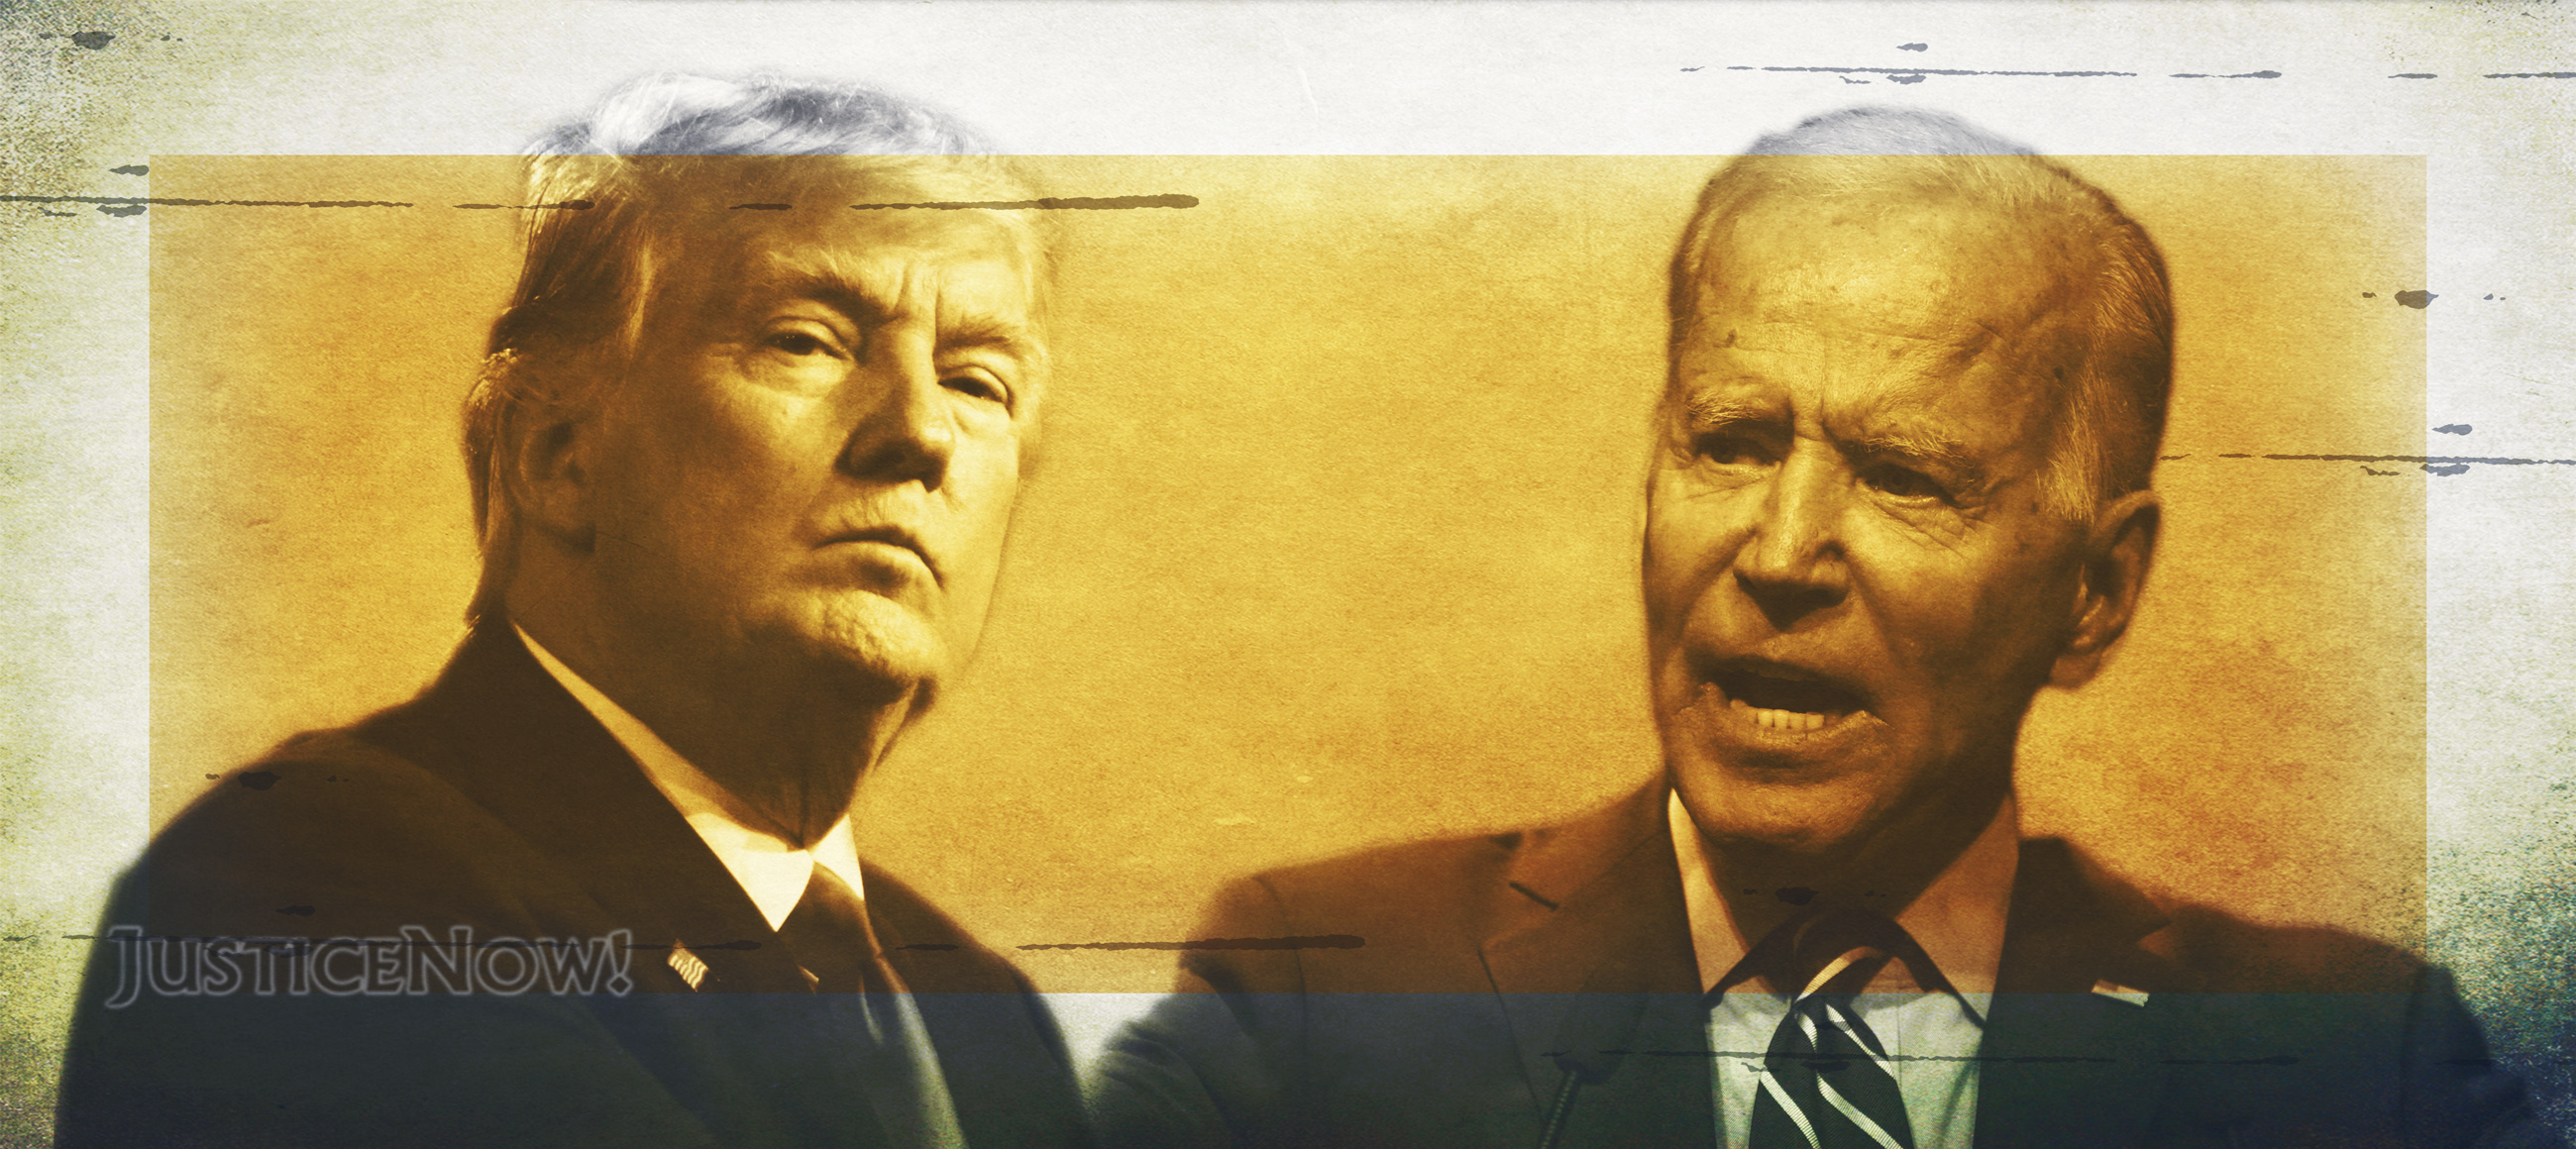 Pest und Cholera <br>  <span id='sec-title'>US-Wahlen 2020</span>